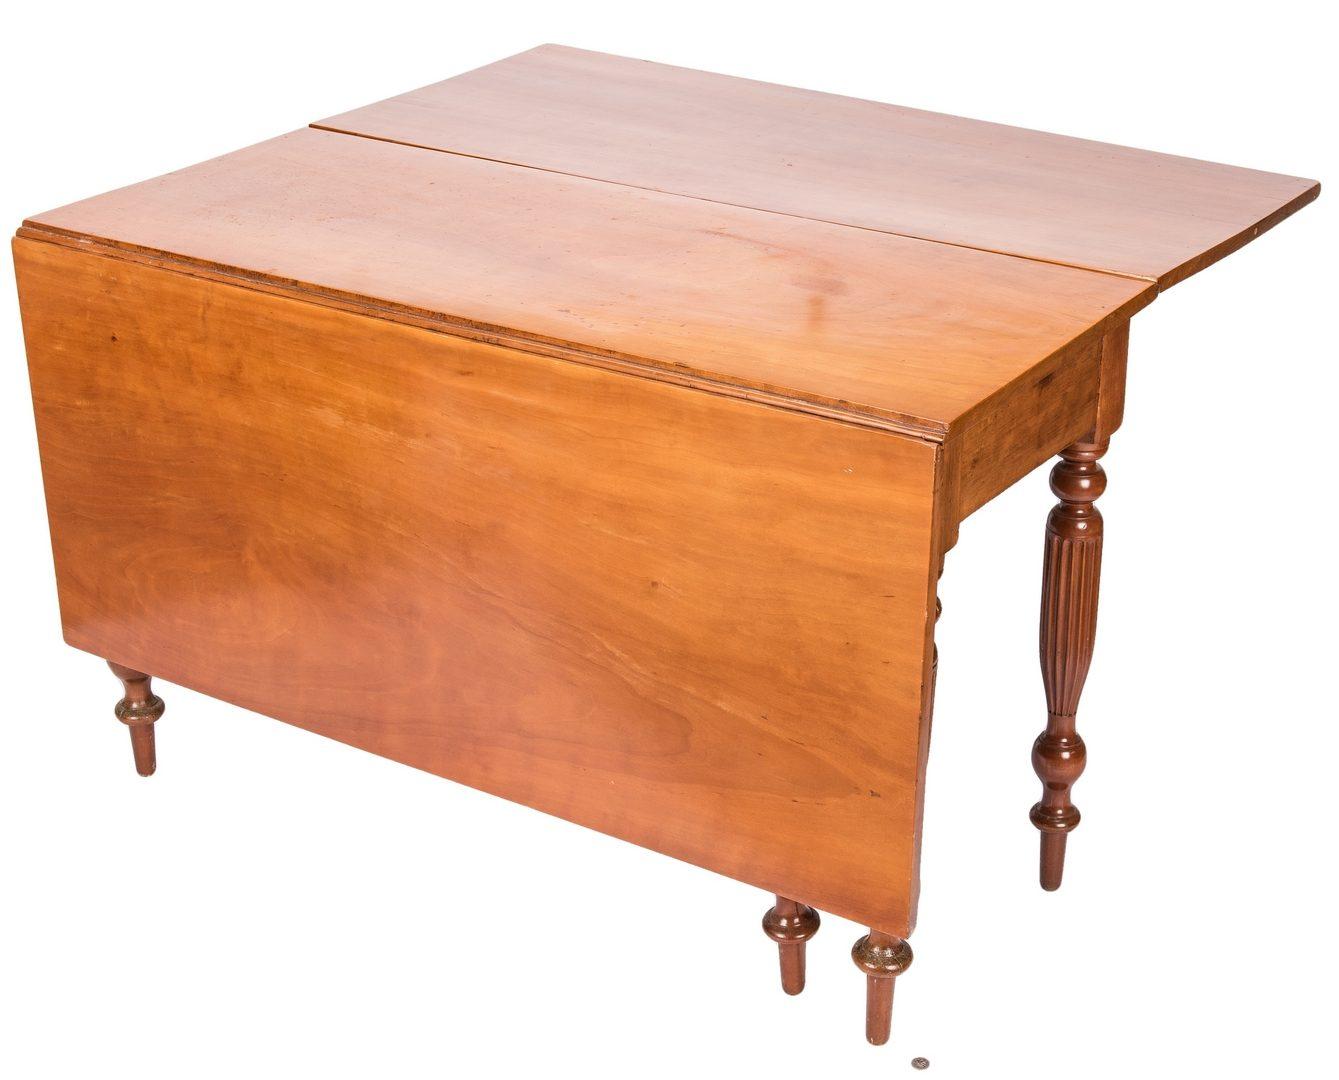 Lot 123: Kentucky Sheraton Cherry Drop Leaf Table